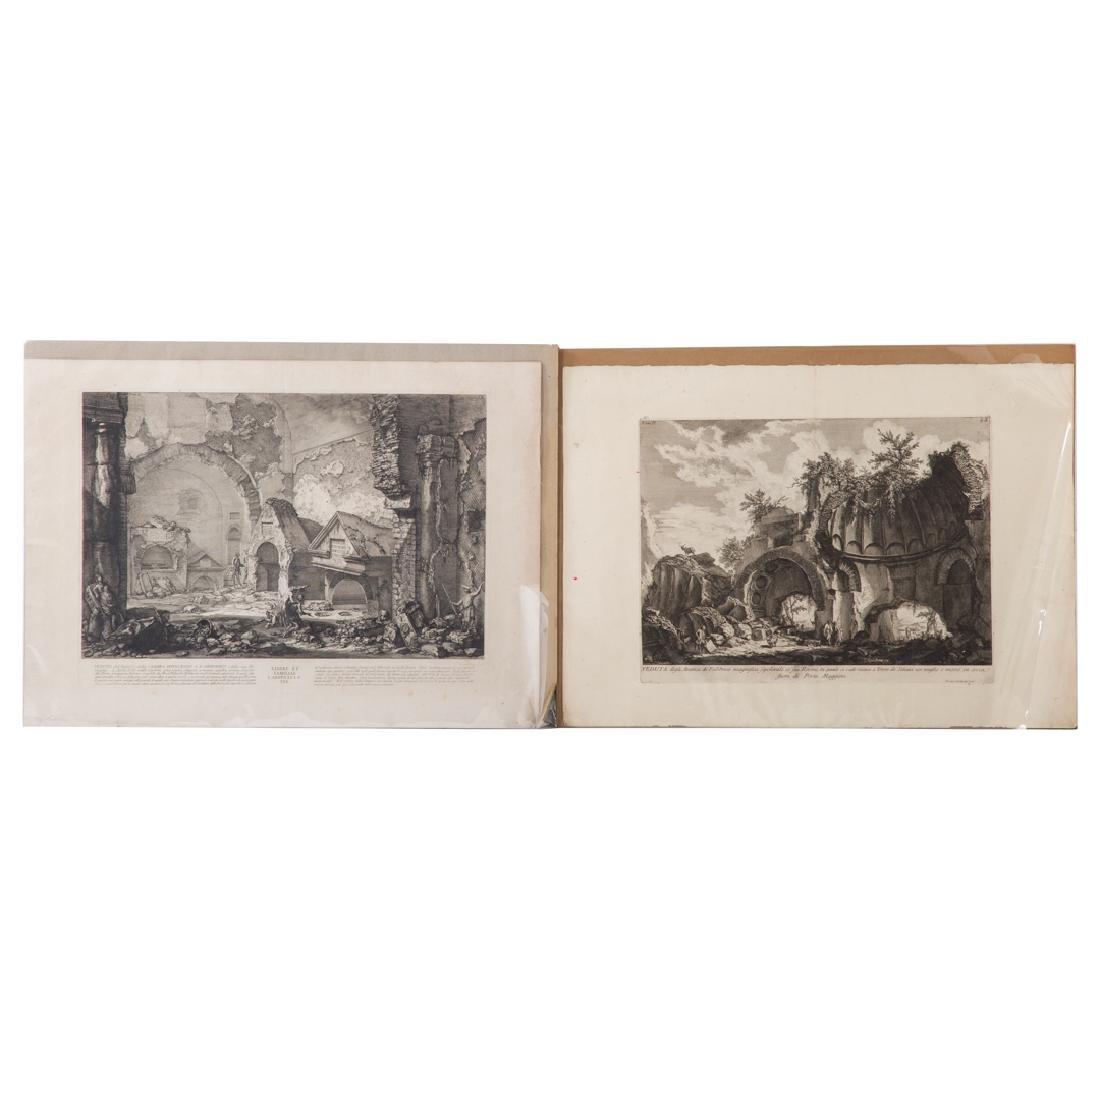 Giovanni Battista Piranesi. 2 unframed engravings